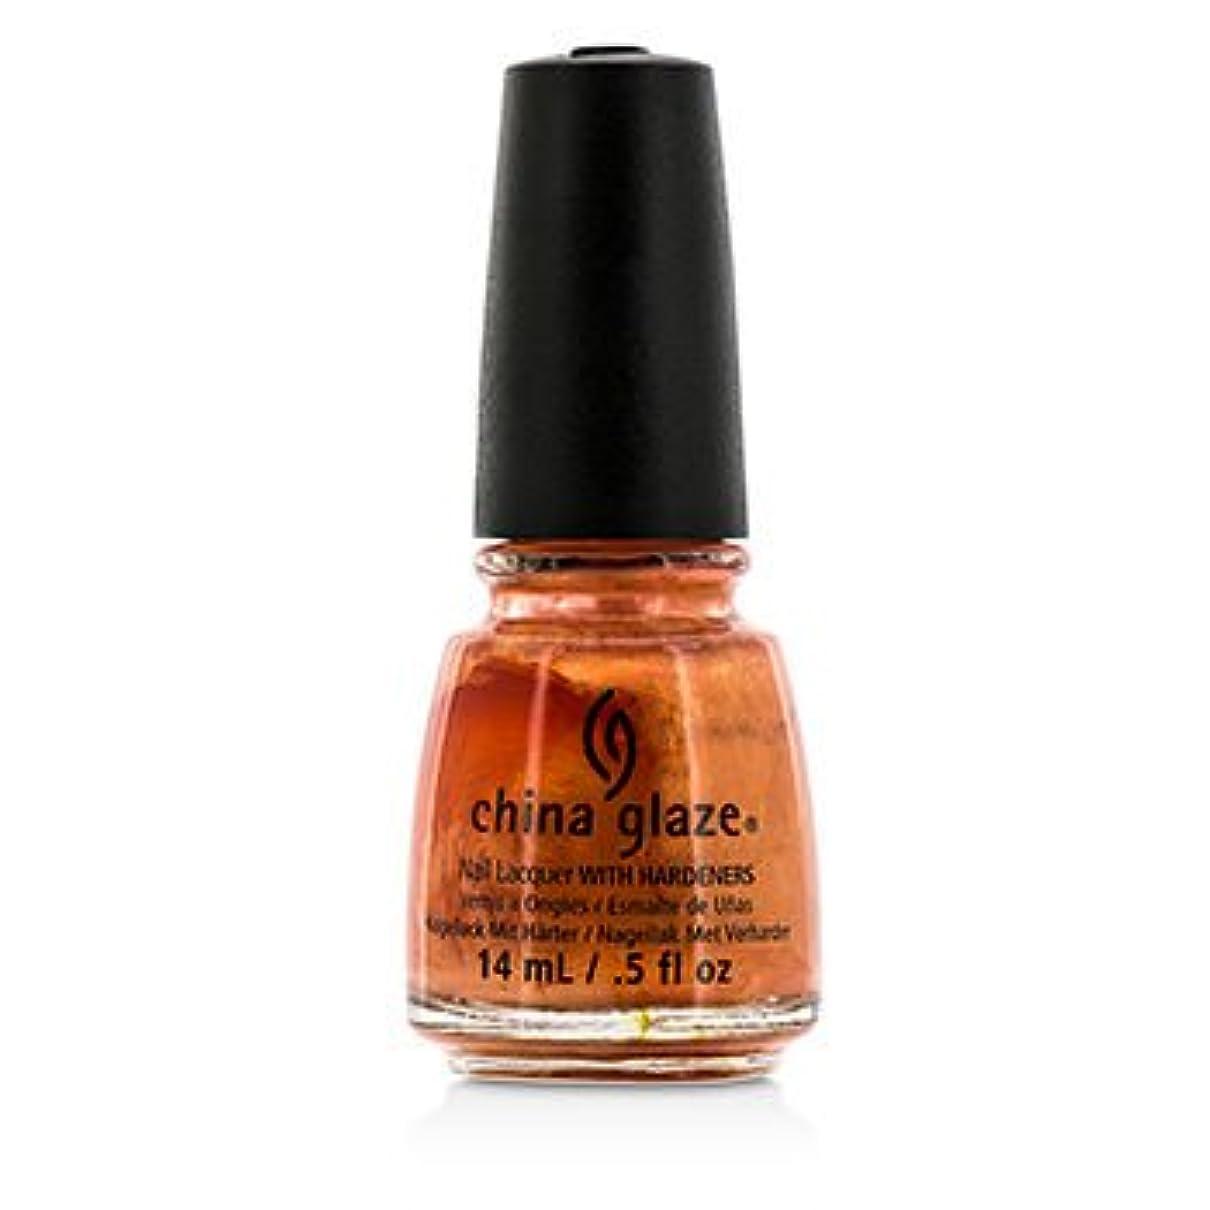 月曜弾性債務[China Glaze] Nail Lacquer - Thataway (093) 14ml/0.5oz